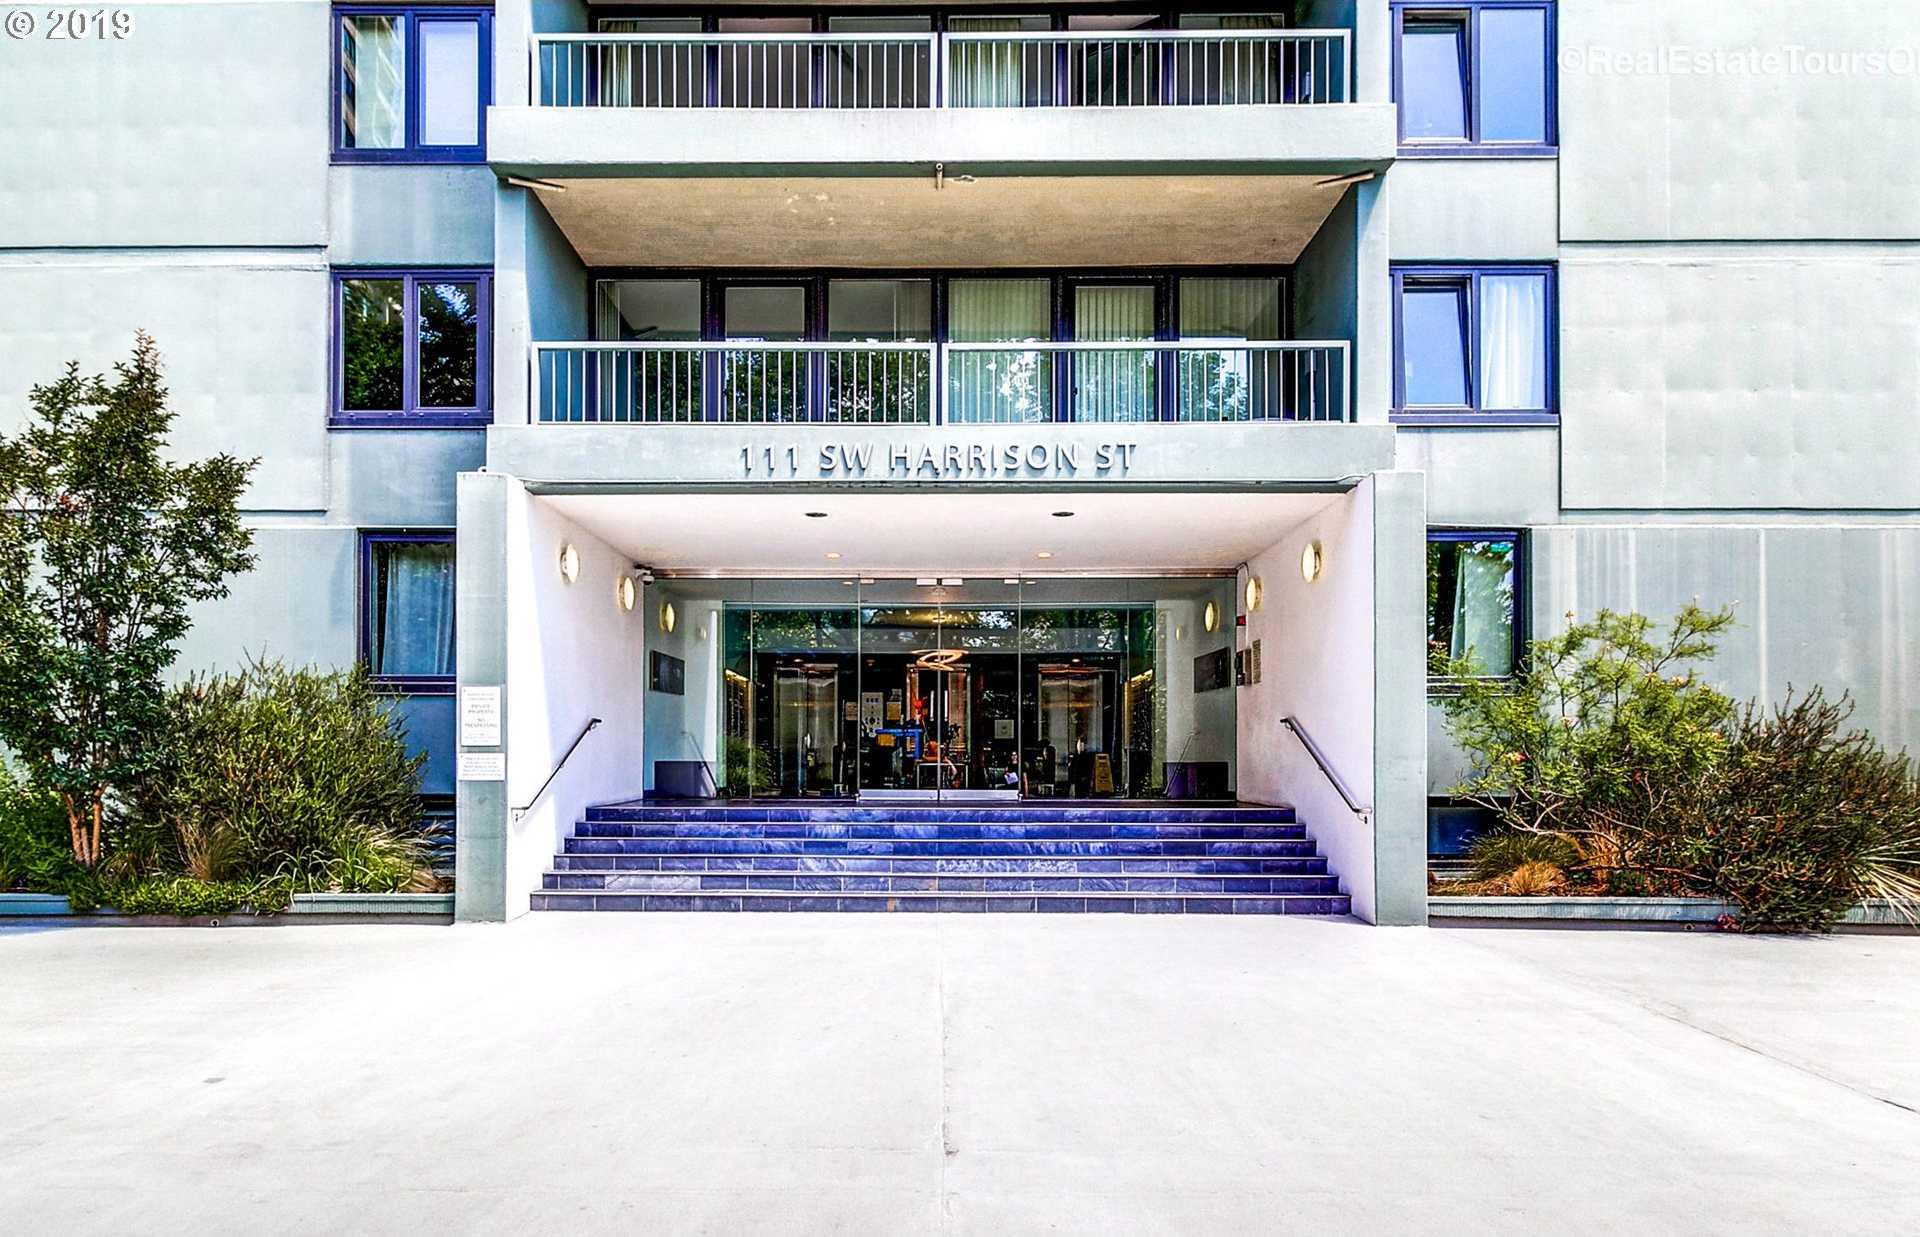 $300,000 - 1Br/1Ba -  for Sale in Harrison East Condo, Portland